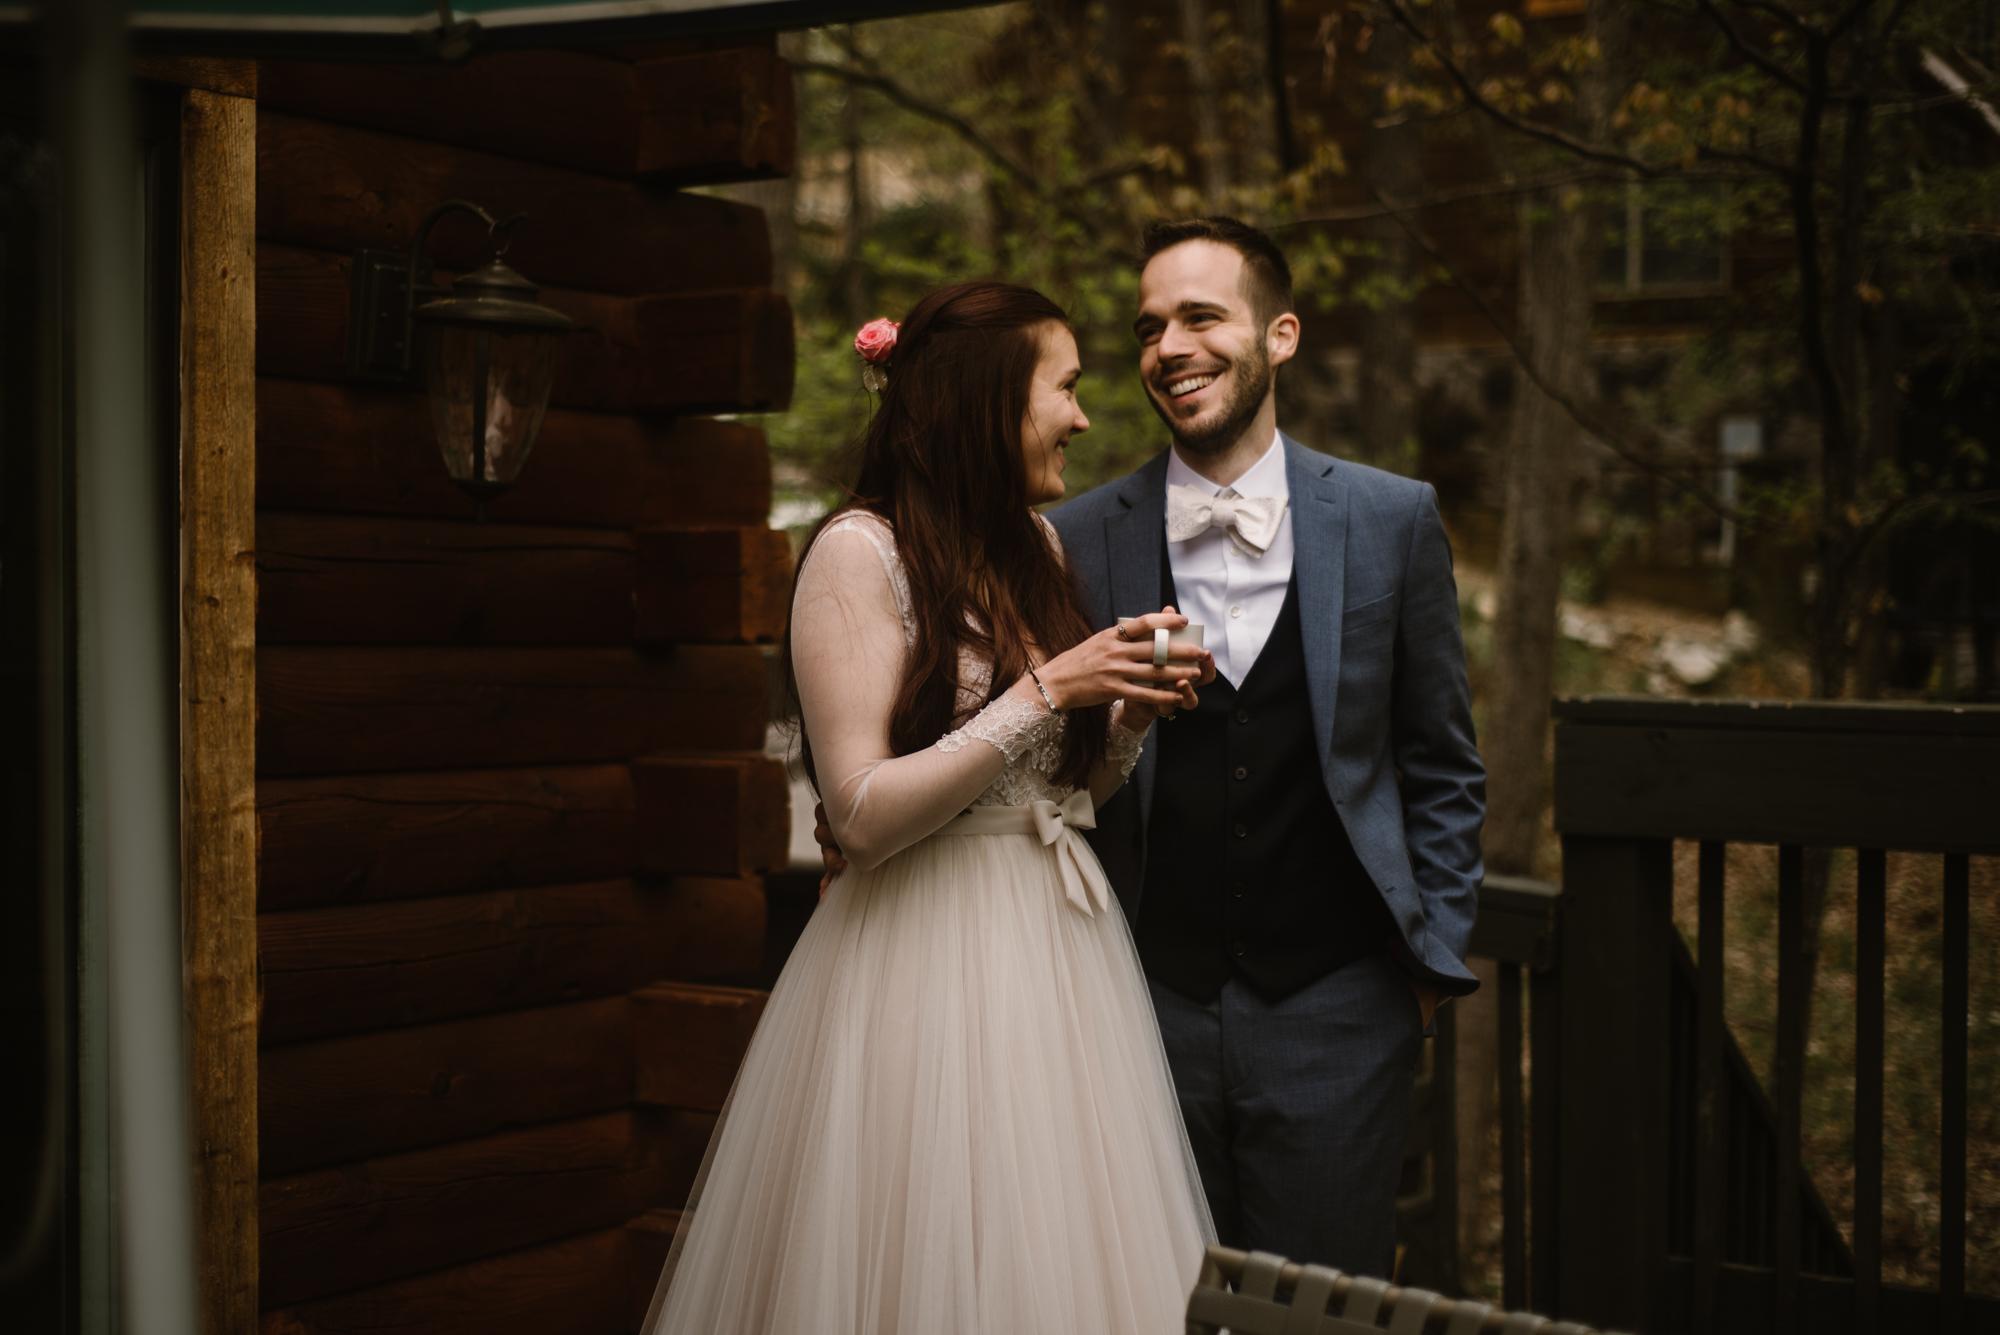 Paula and Andrew - Small Adventurous Wedding in Shenandoah National Park - Blue Ridge Mountain Wedding - White Sails Creative - Mountain Elopement_49.jpg